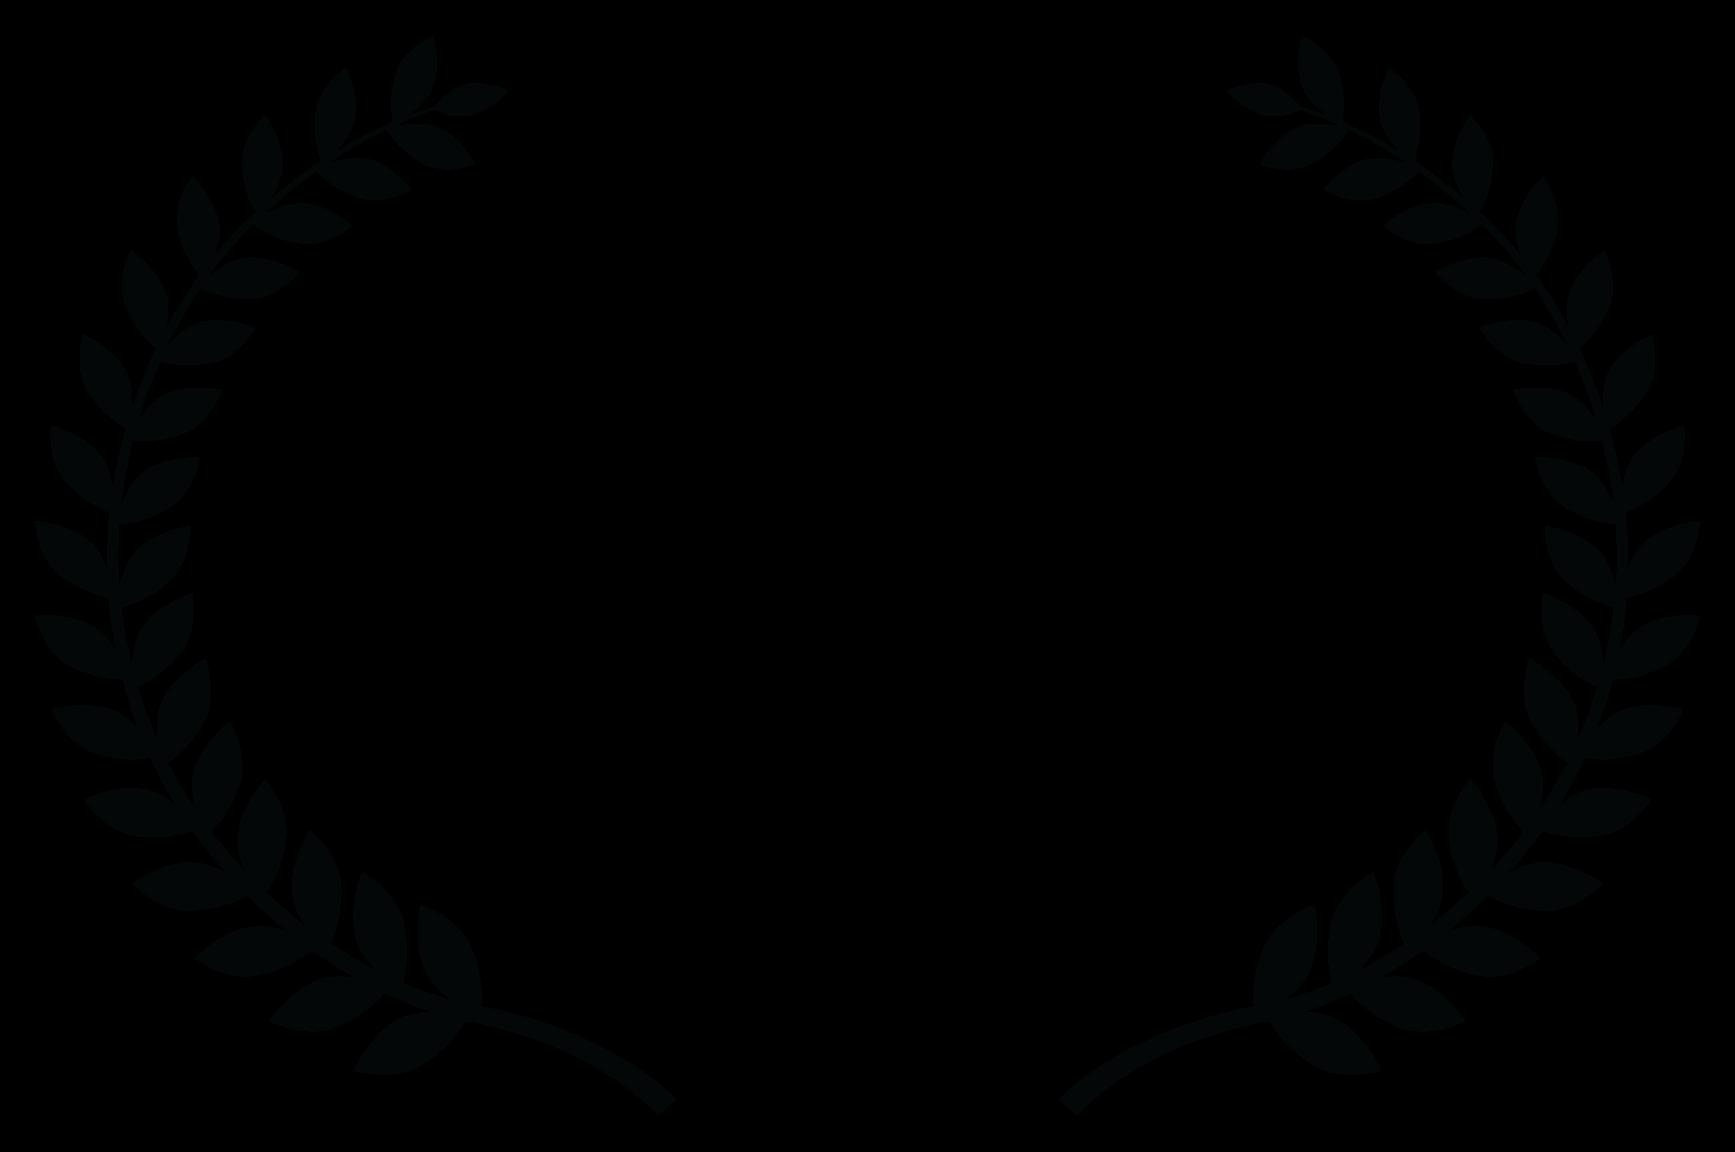 OFFICIAL SELECTION - Festival del Cinema